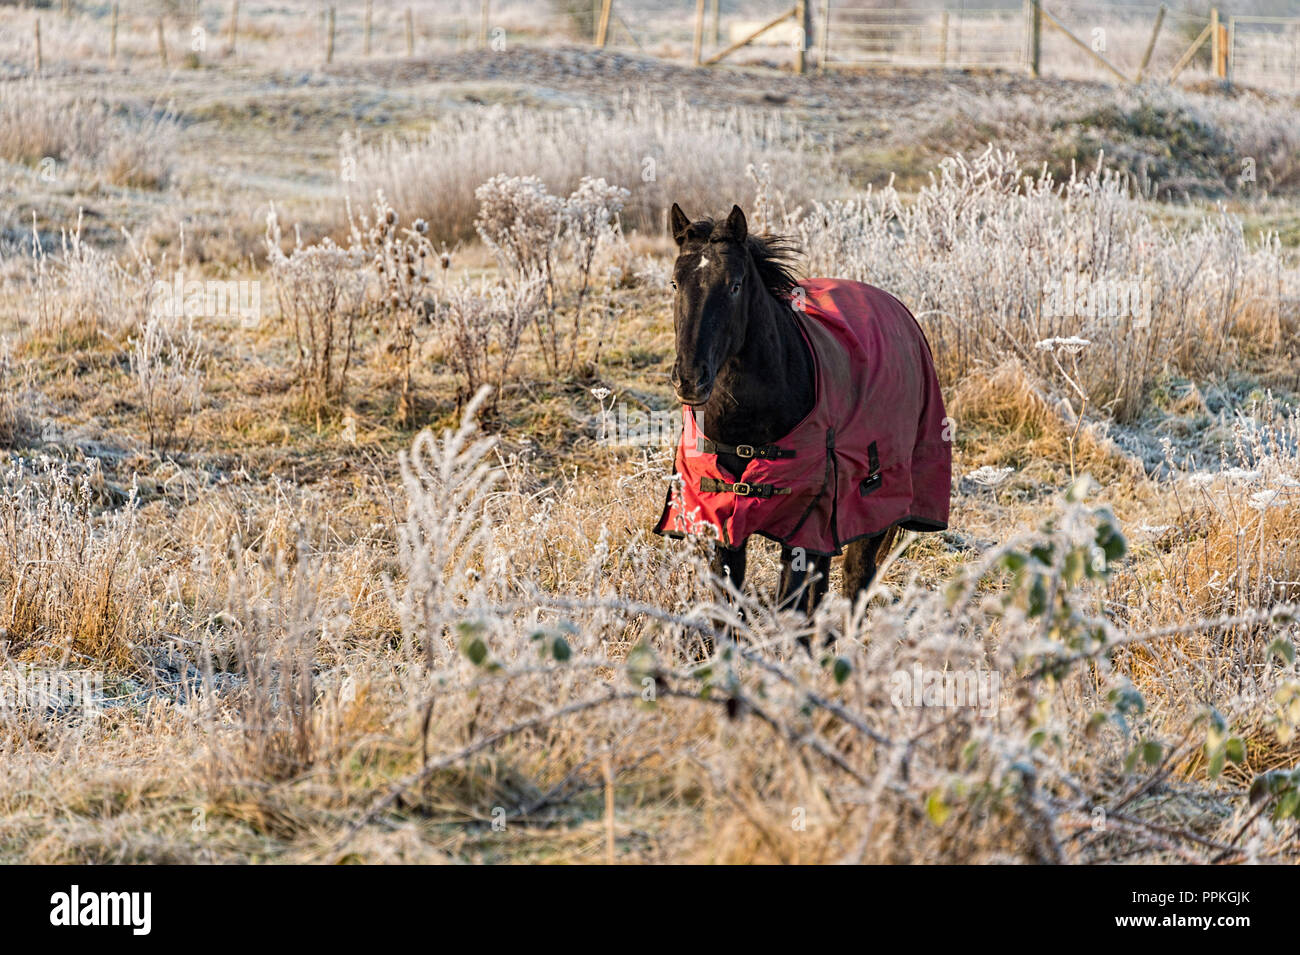 Horse in frosty field - Stock Image